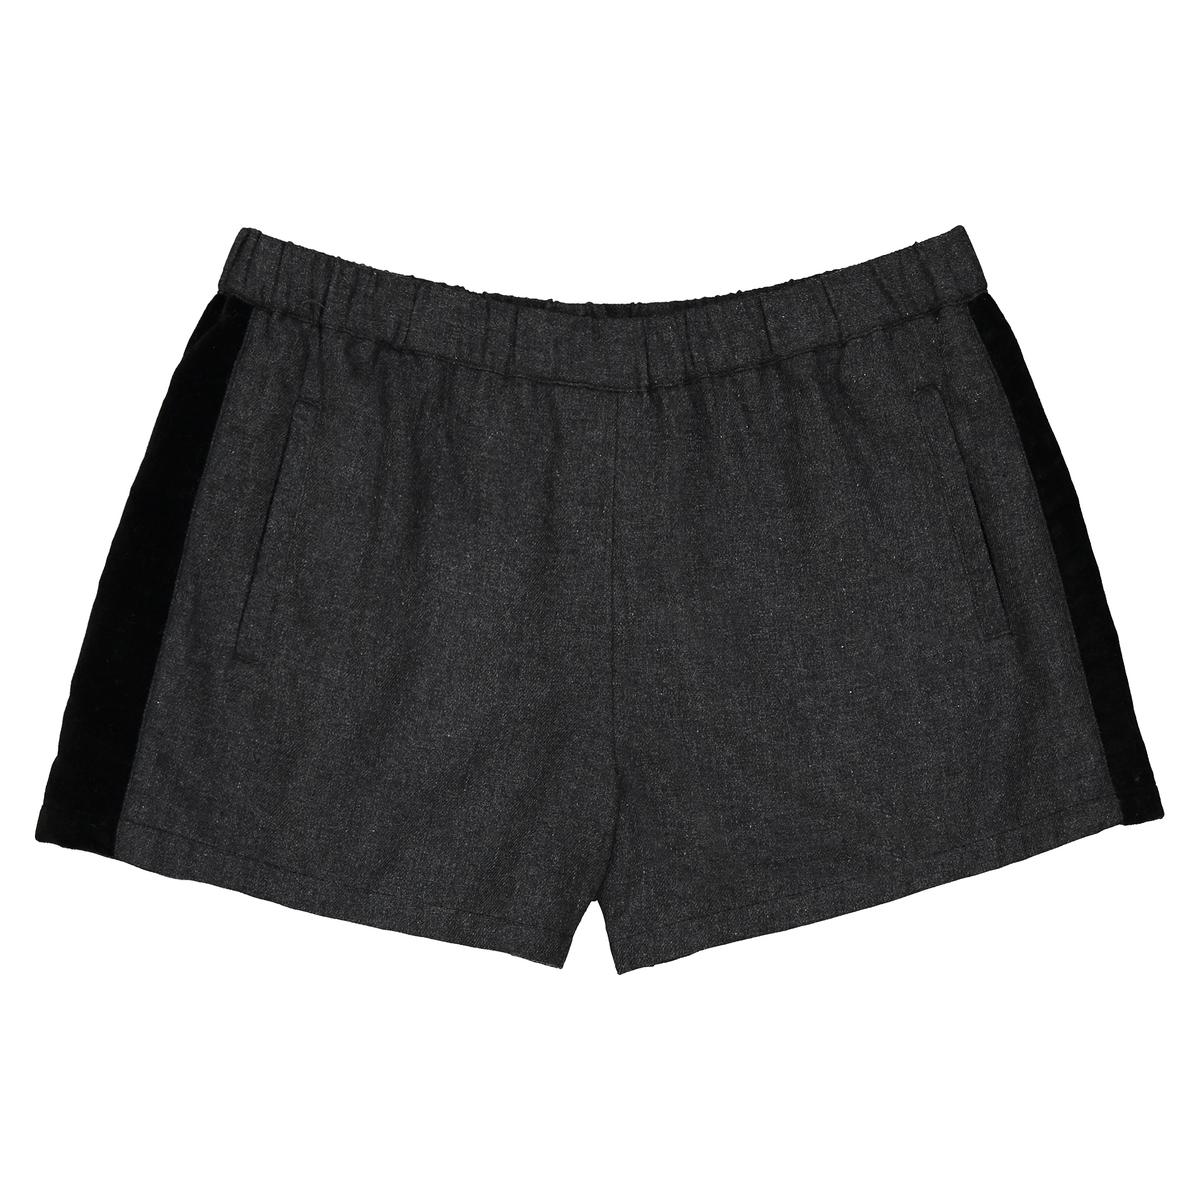 Shorts fascia velluto 3 - 12 anni